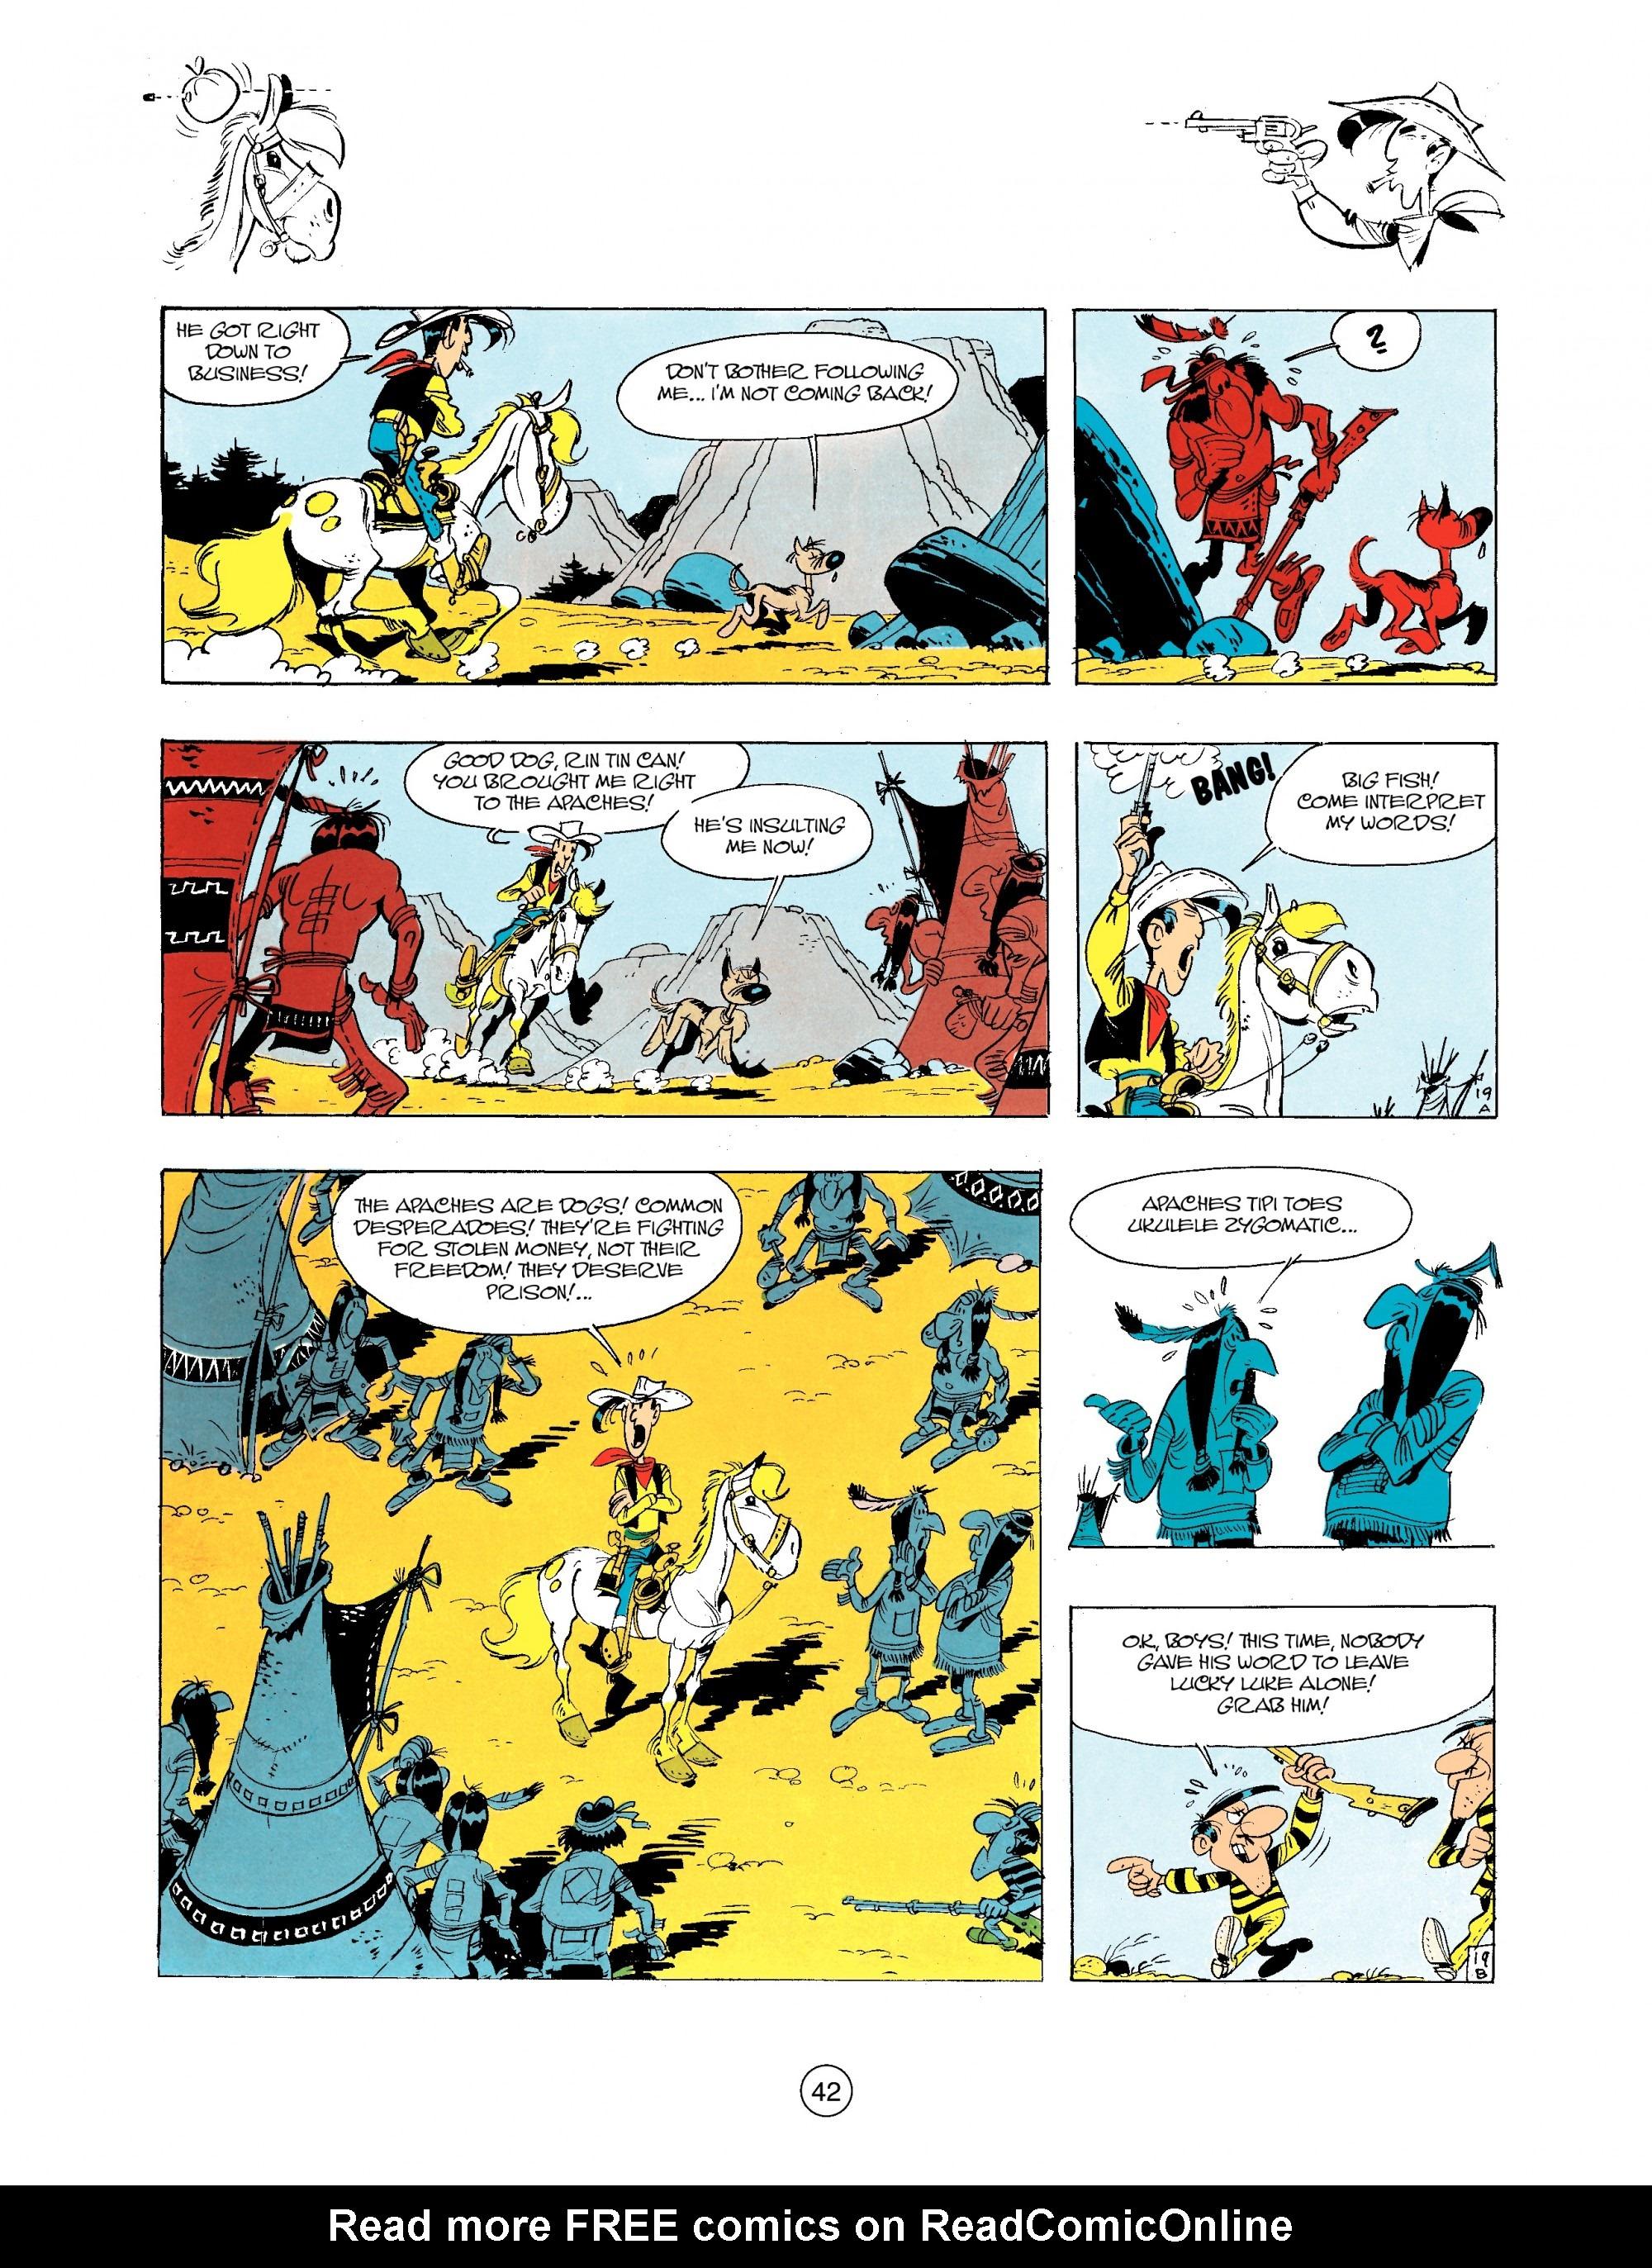 A Lucky Luke Adventure 34 Page 41